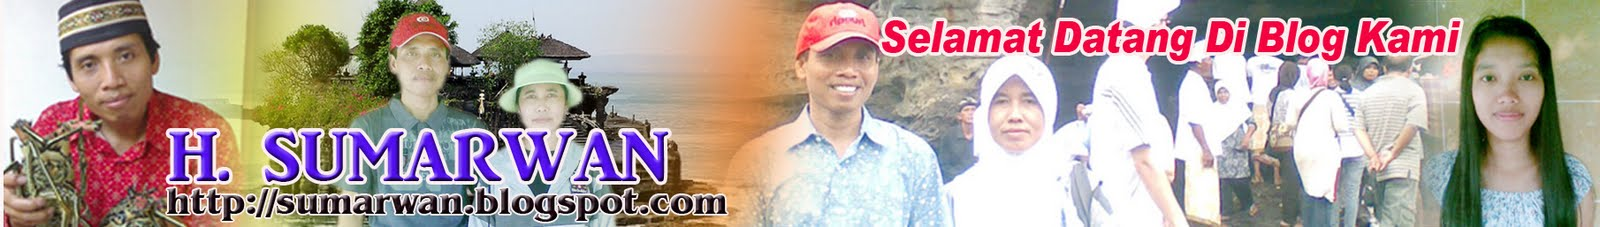 H.SUMARWAN